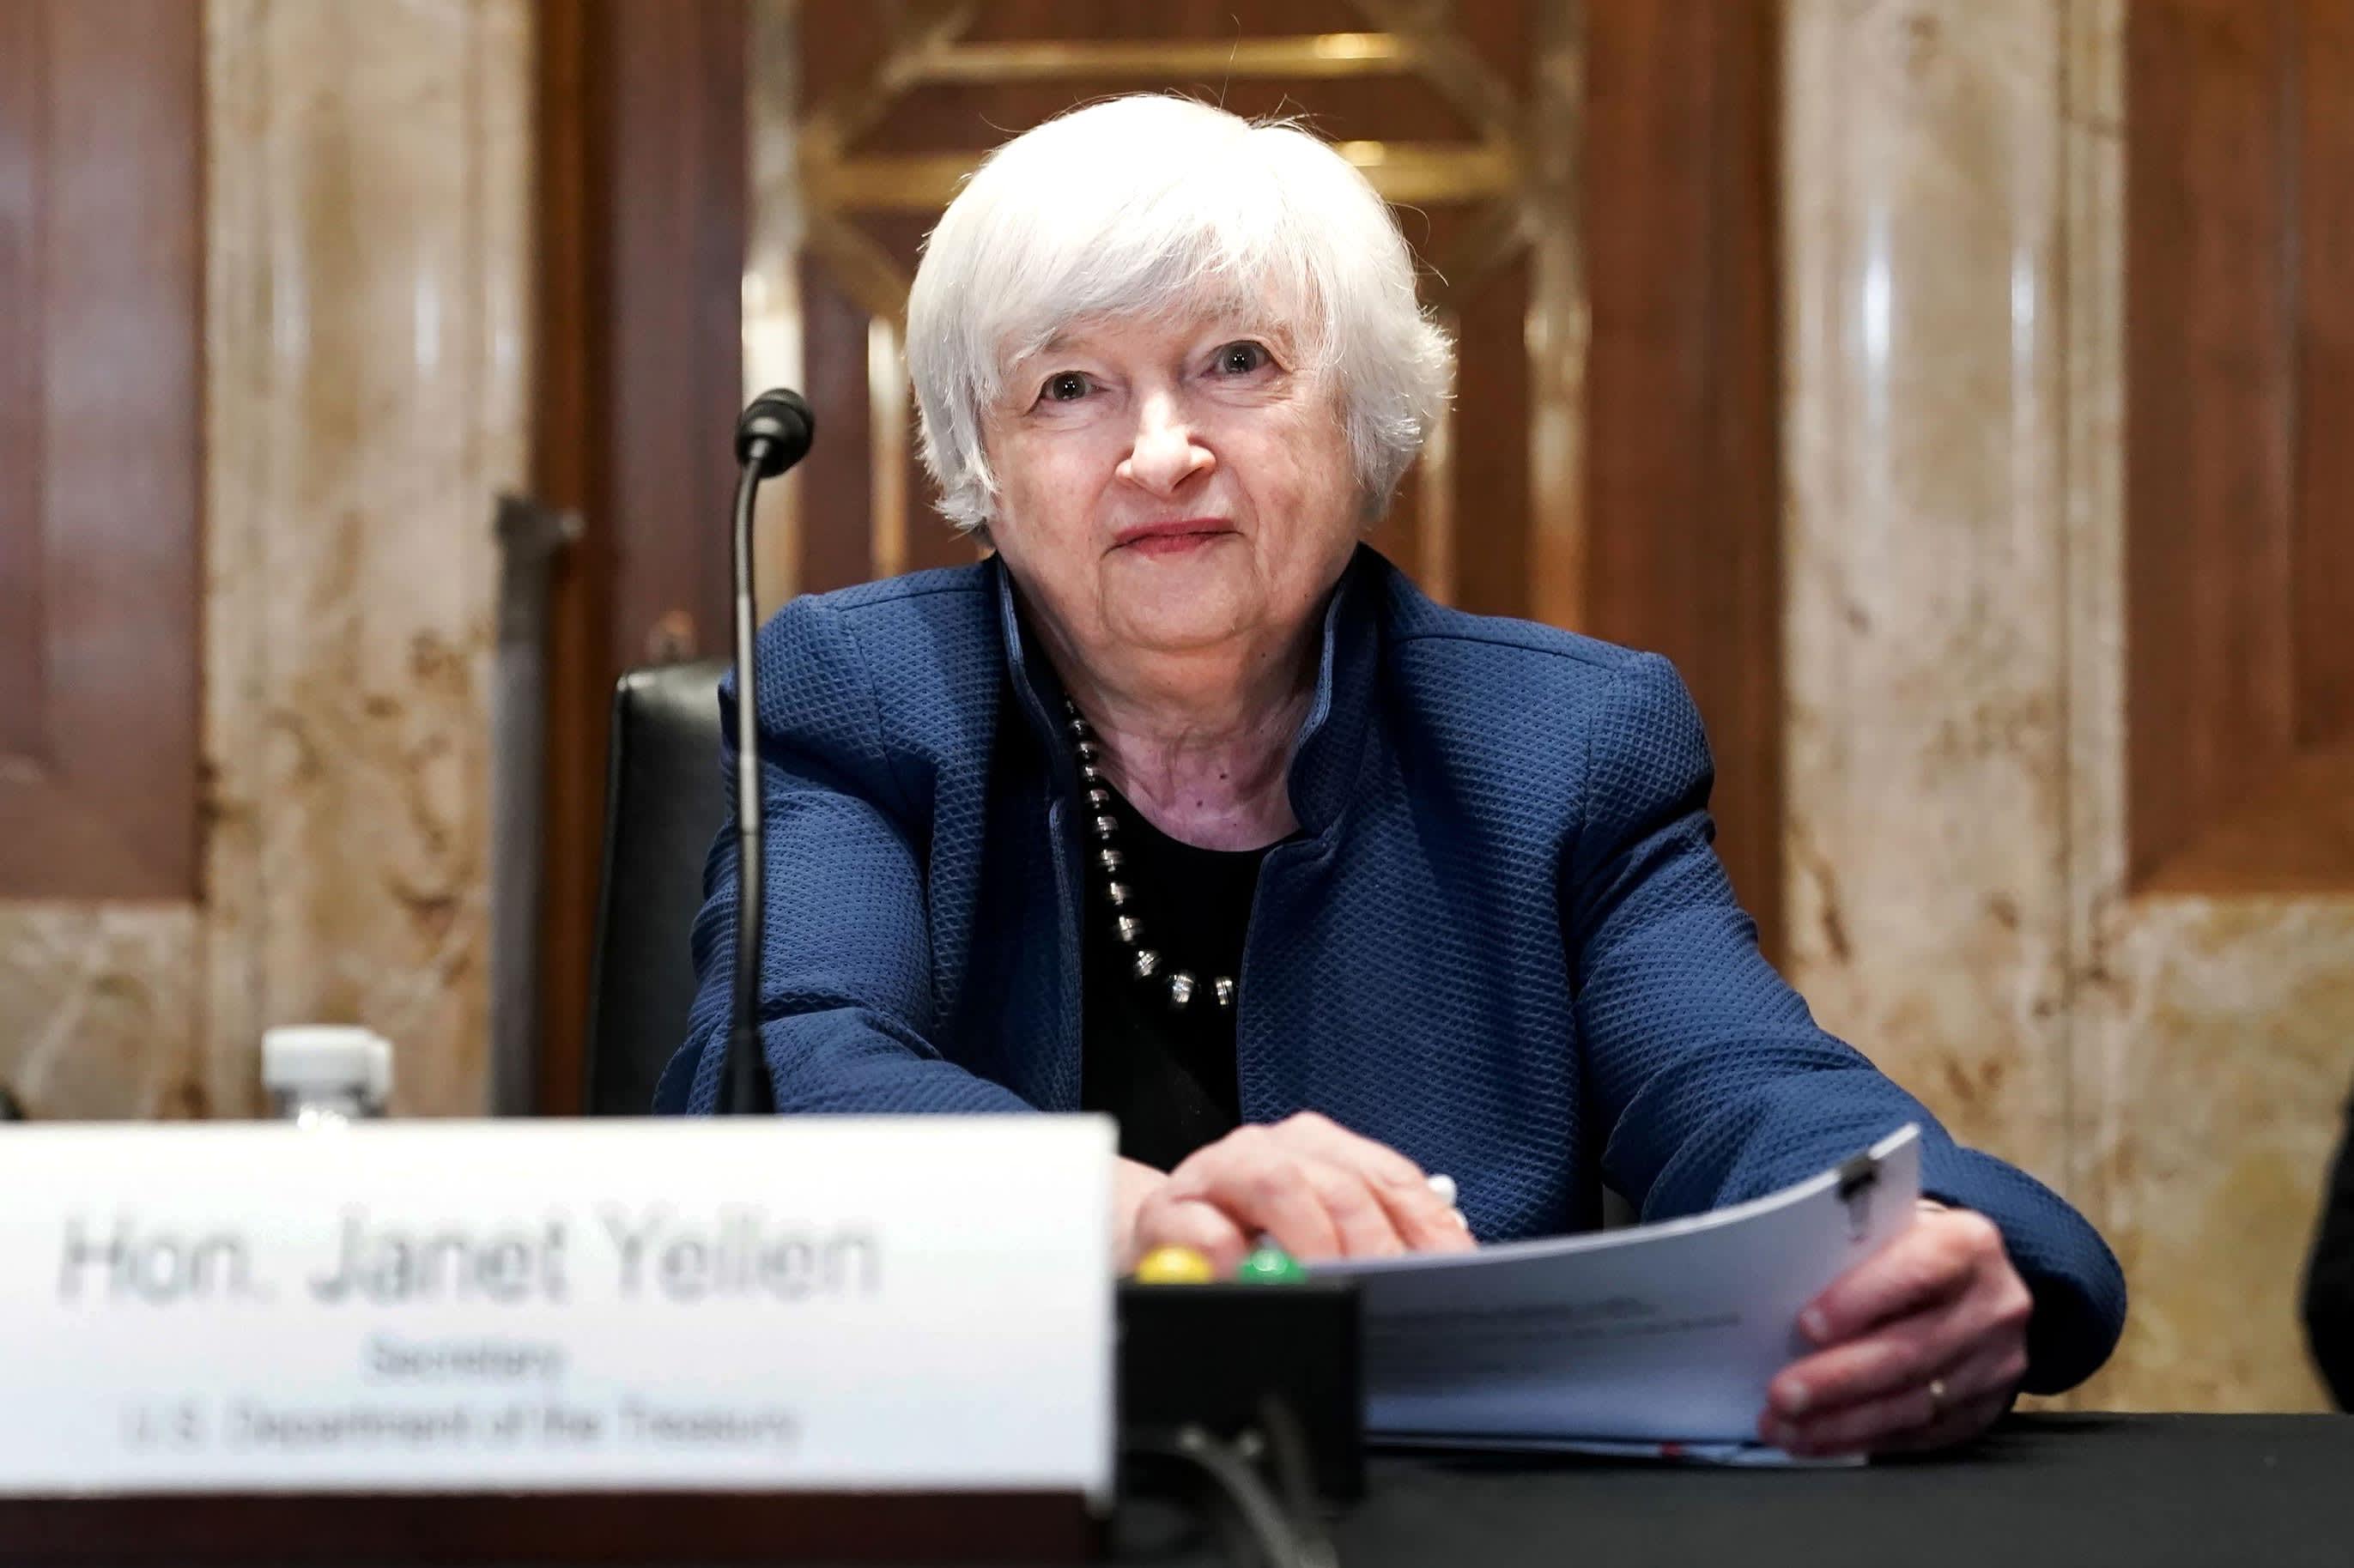 Congress must raise debt limit by Oct. 18, Treasury Secretary Yellen warns in new letter as default looms